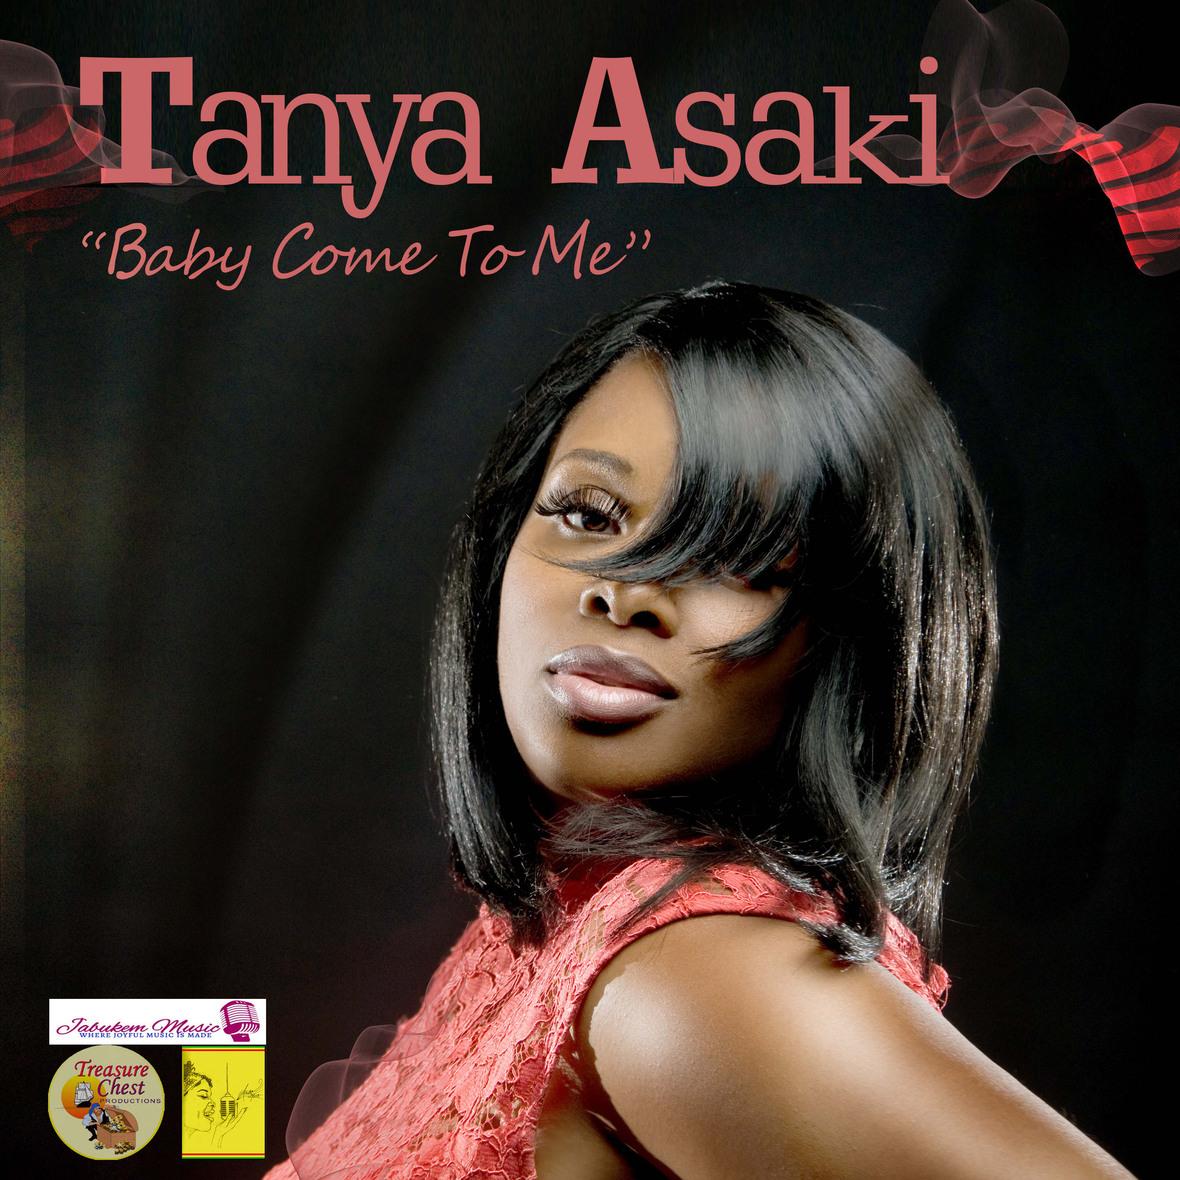 Head shot of music artist Tanya Asaki